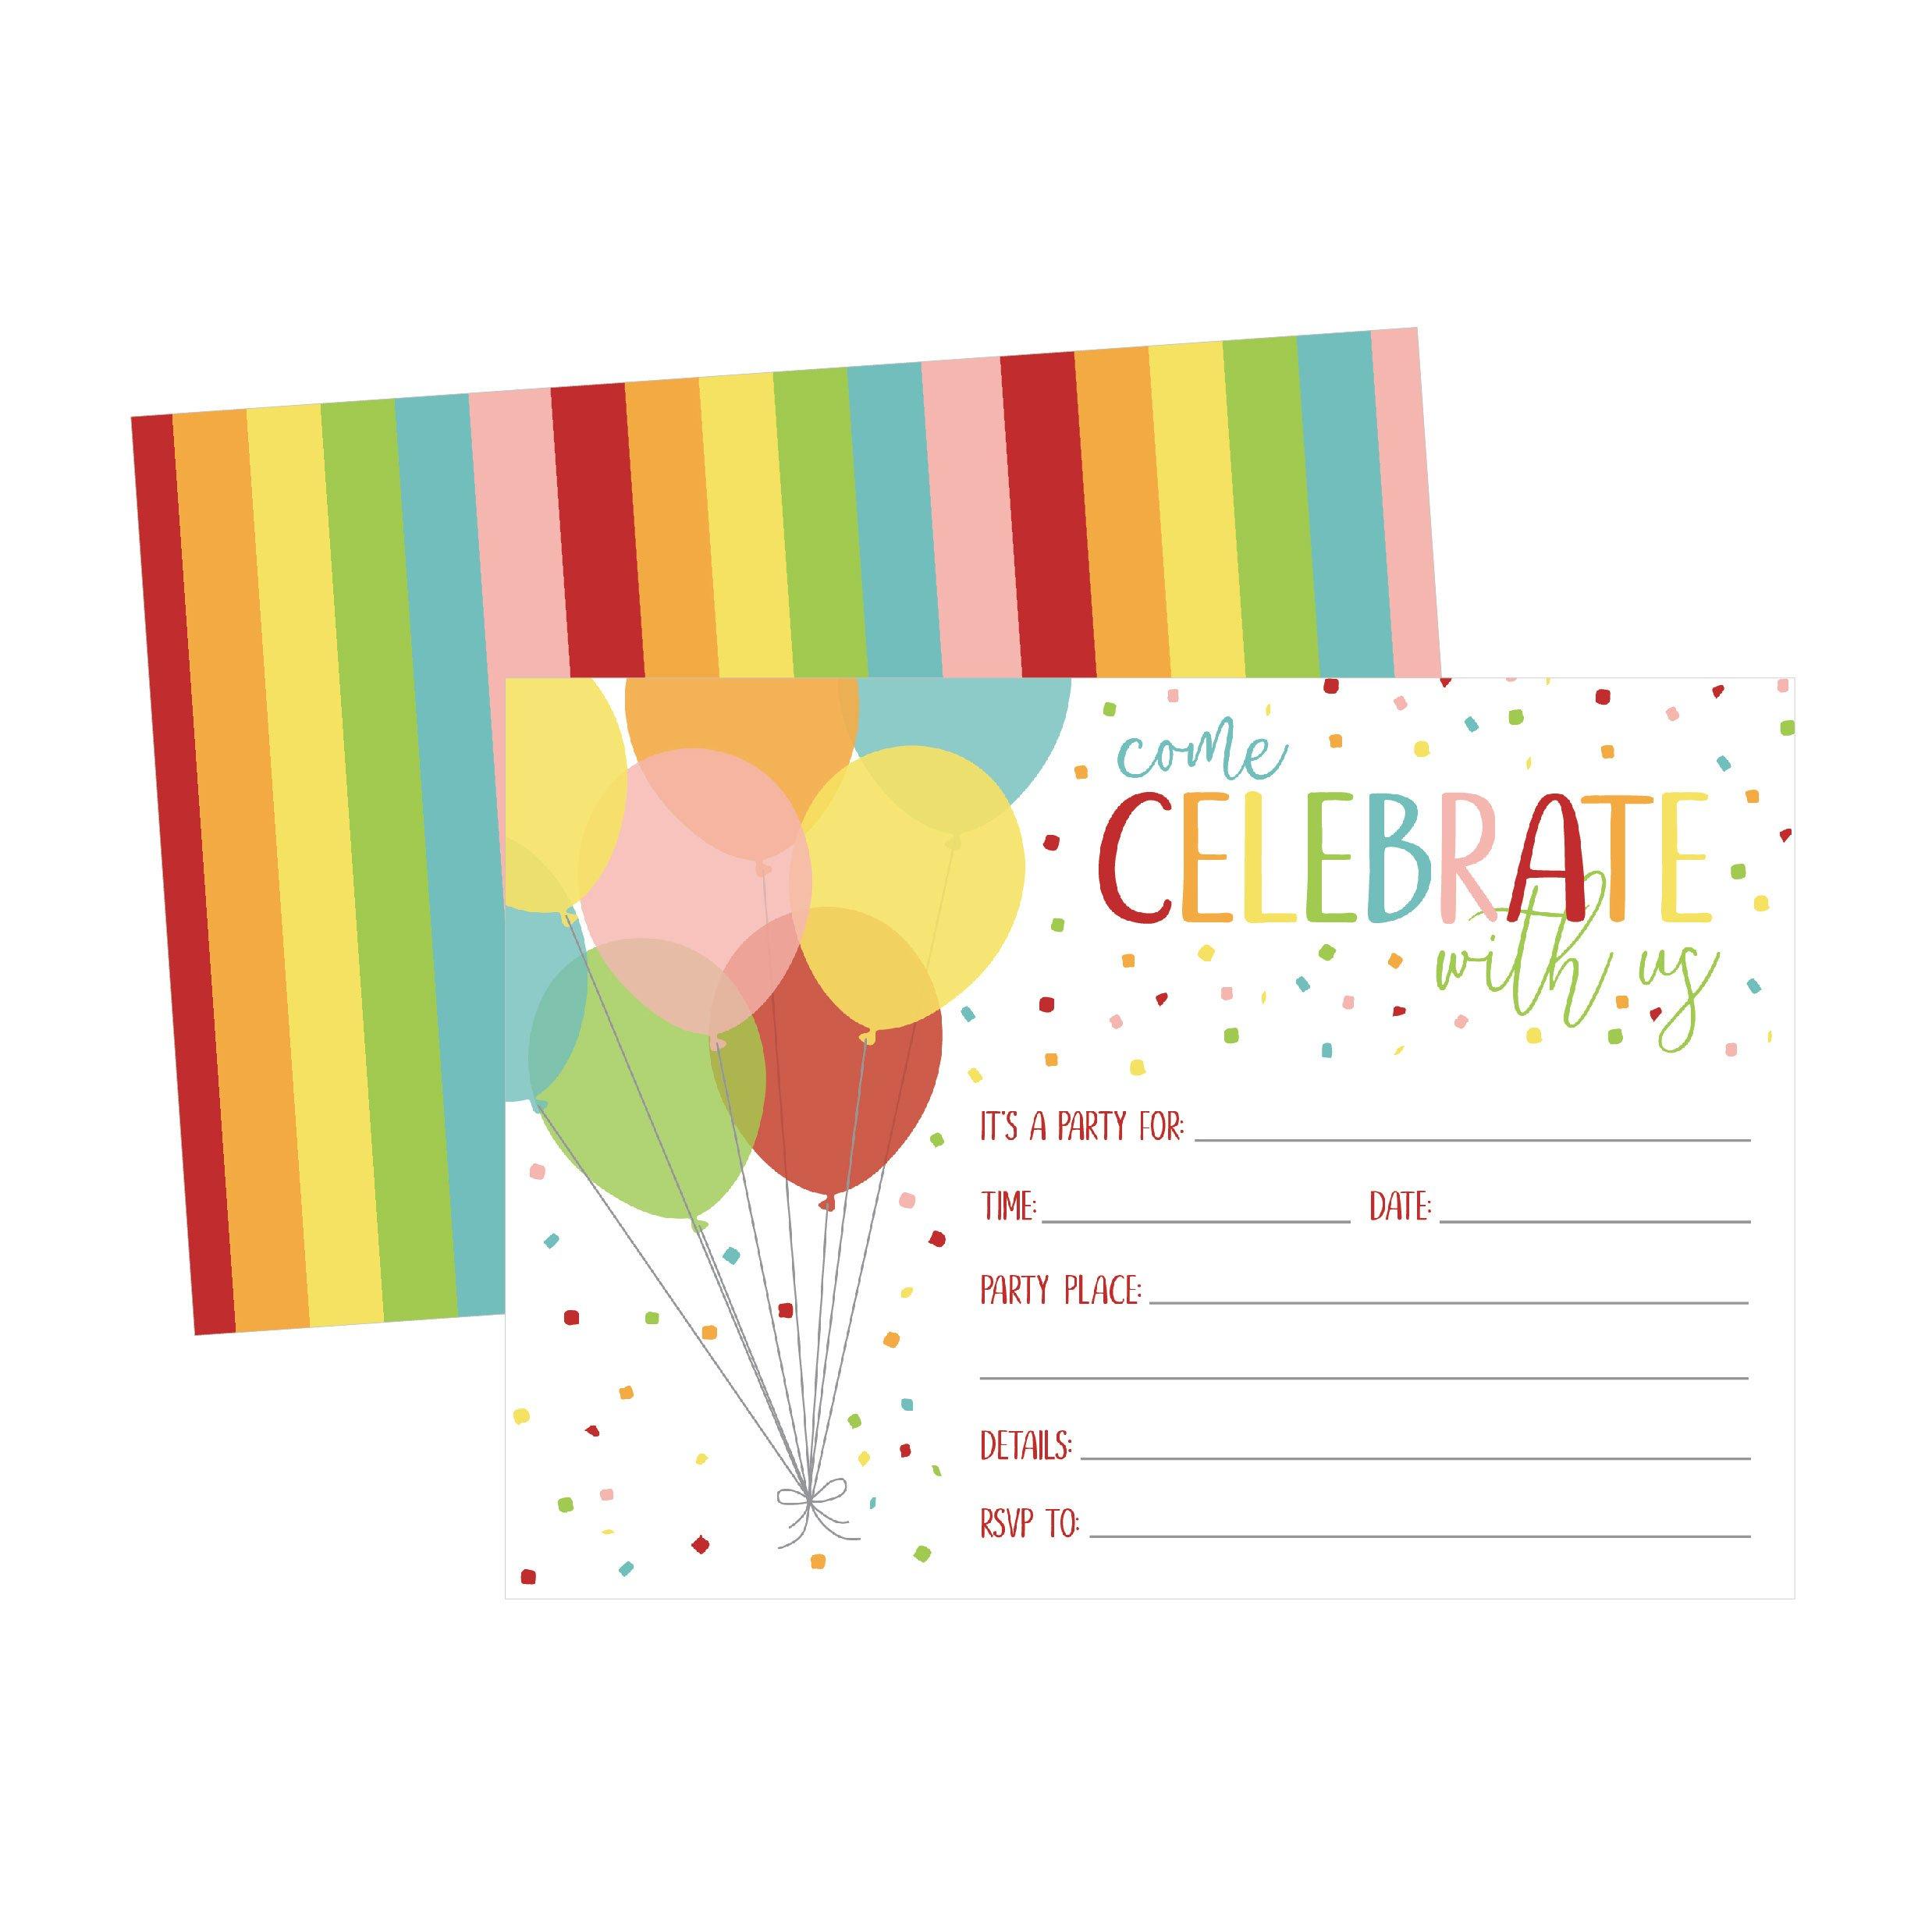 25 Rainbow Balloon Party Invitations for Kids, Teens, Adults, Boys ...